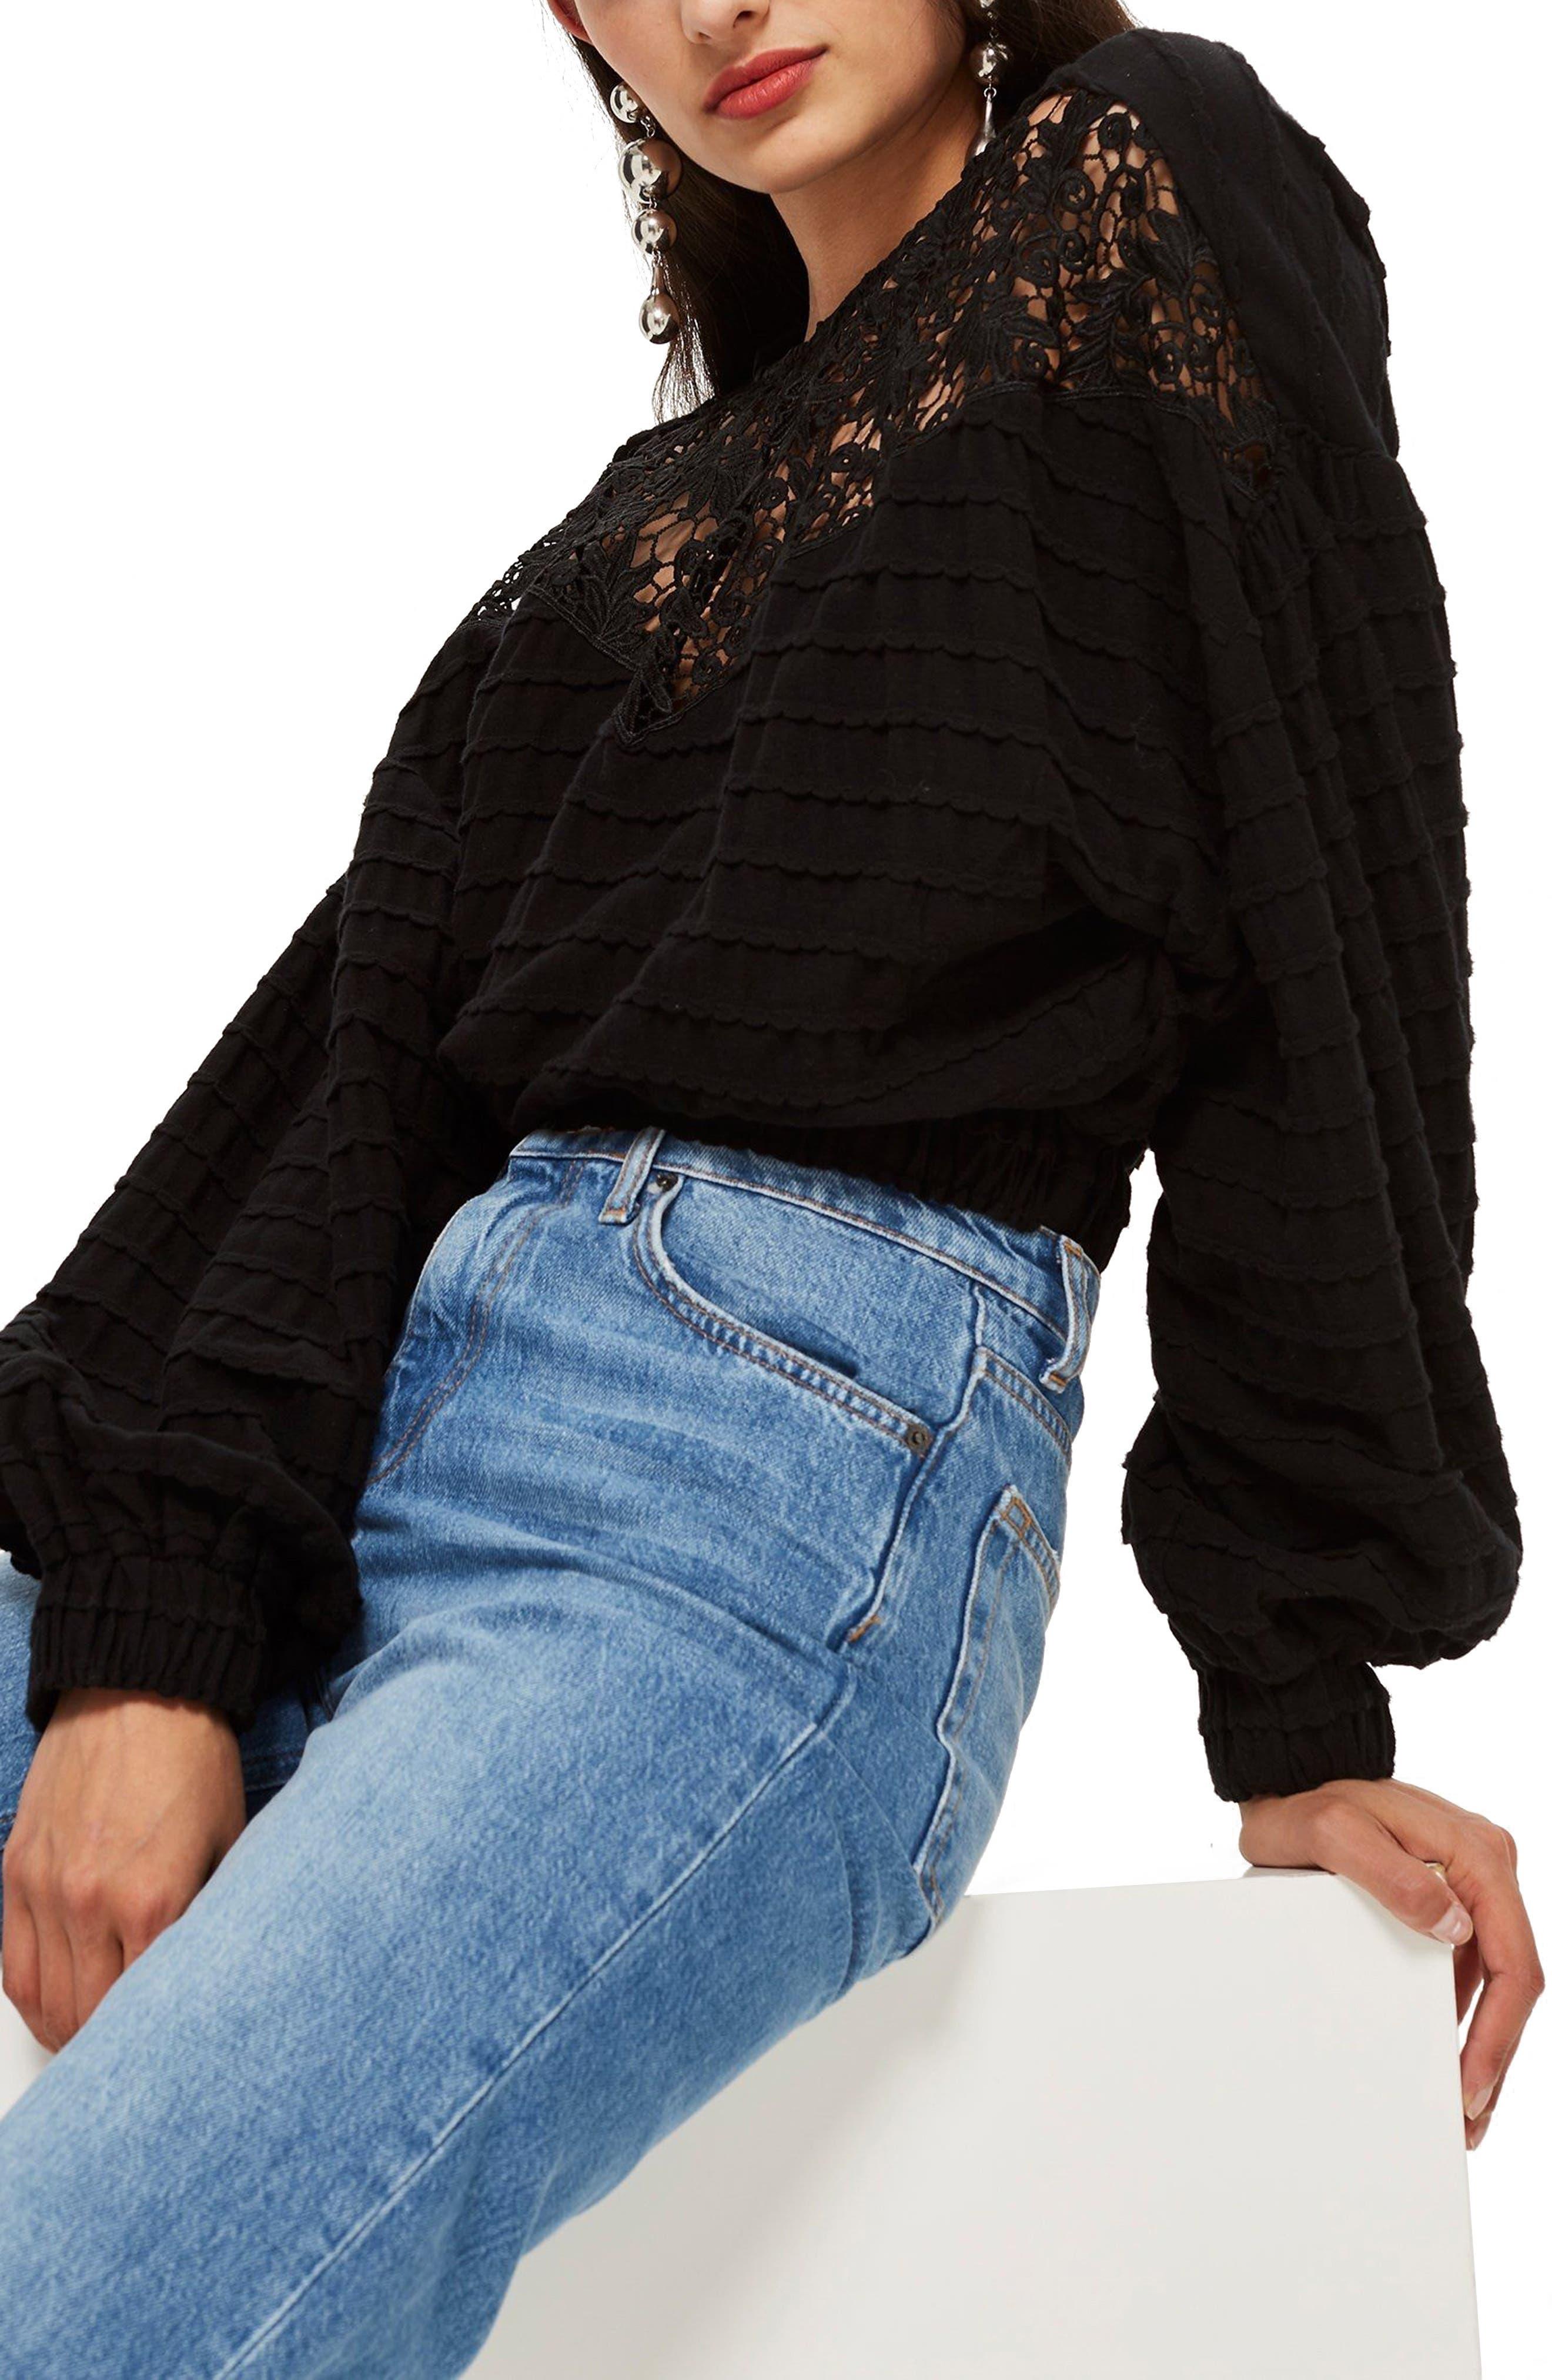 Crochet Inset Top,                         Main,                         color, Black